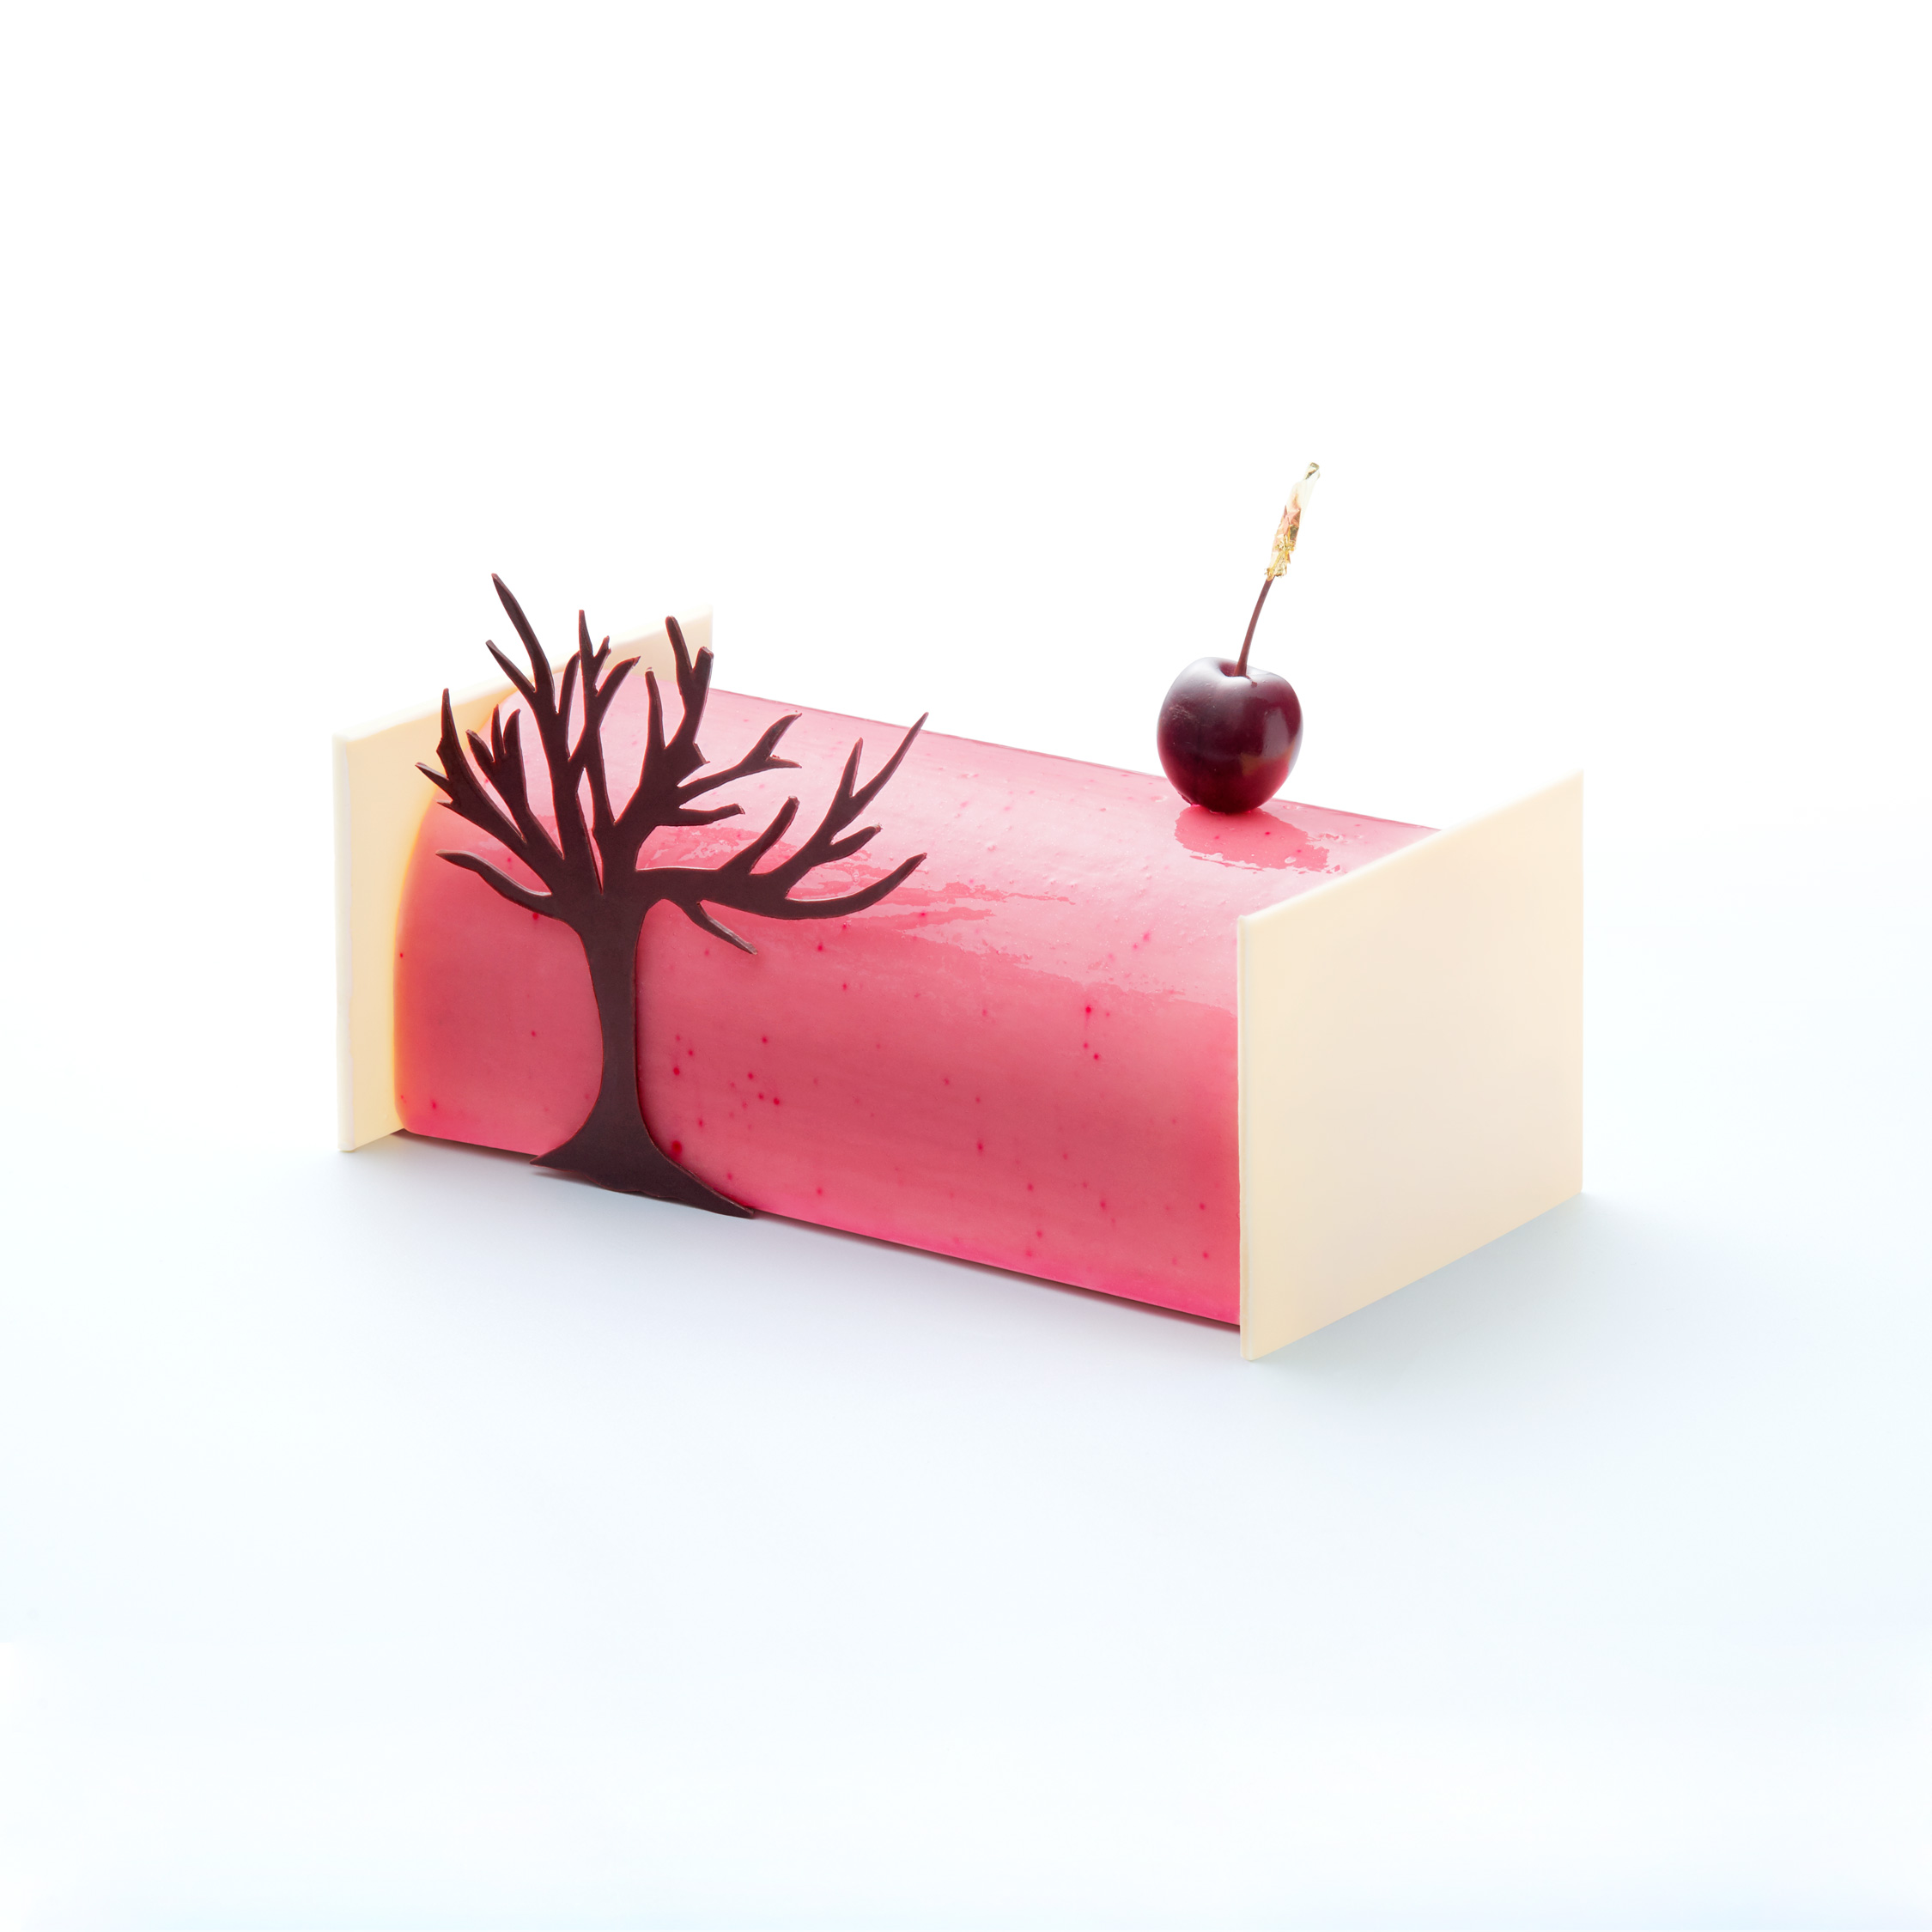 top buches noel 2016 bouillet buche d lices. Black Bedroom Furniture Sets. Home Design Ideas